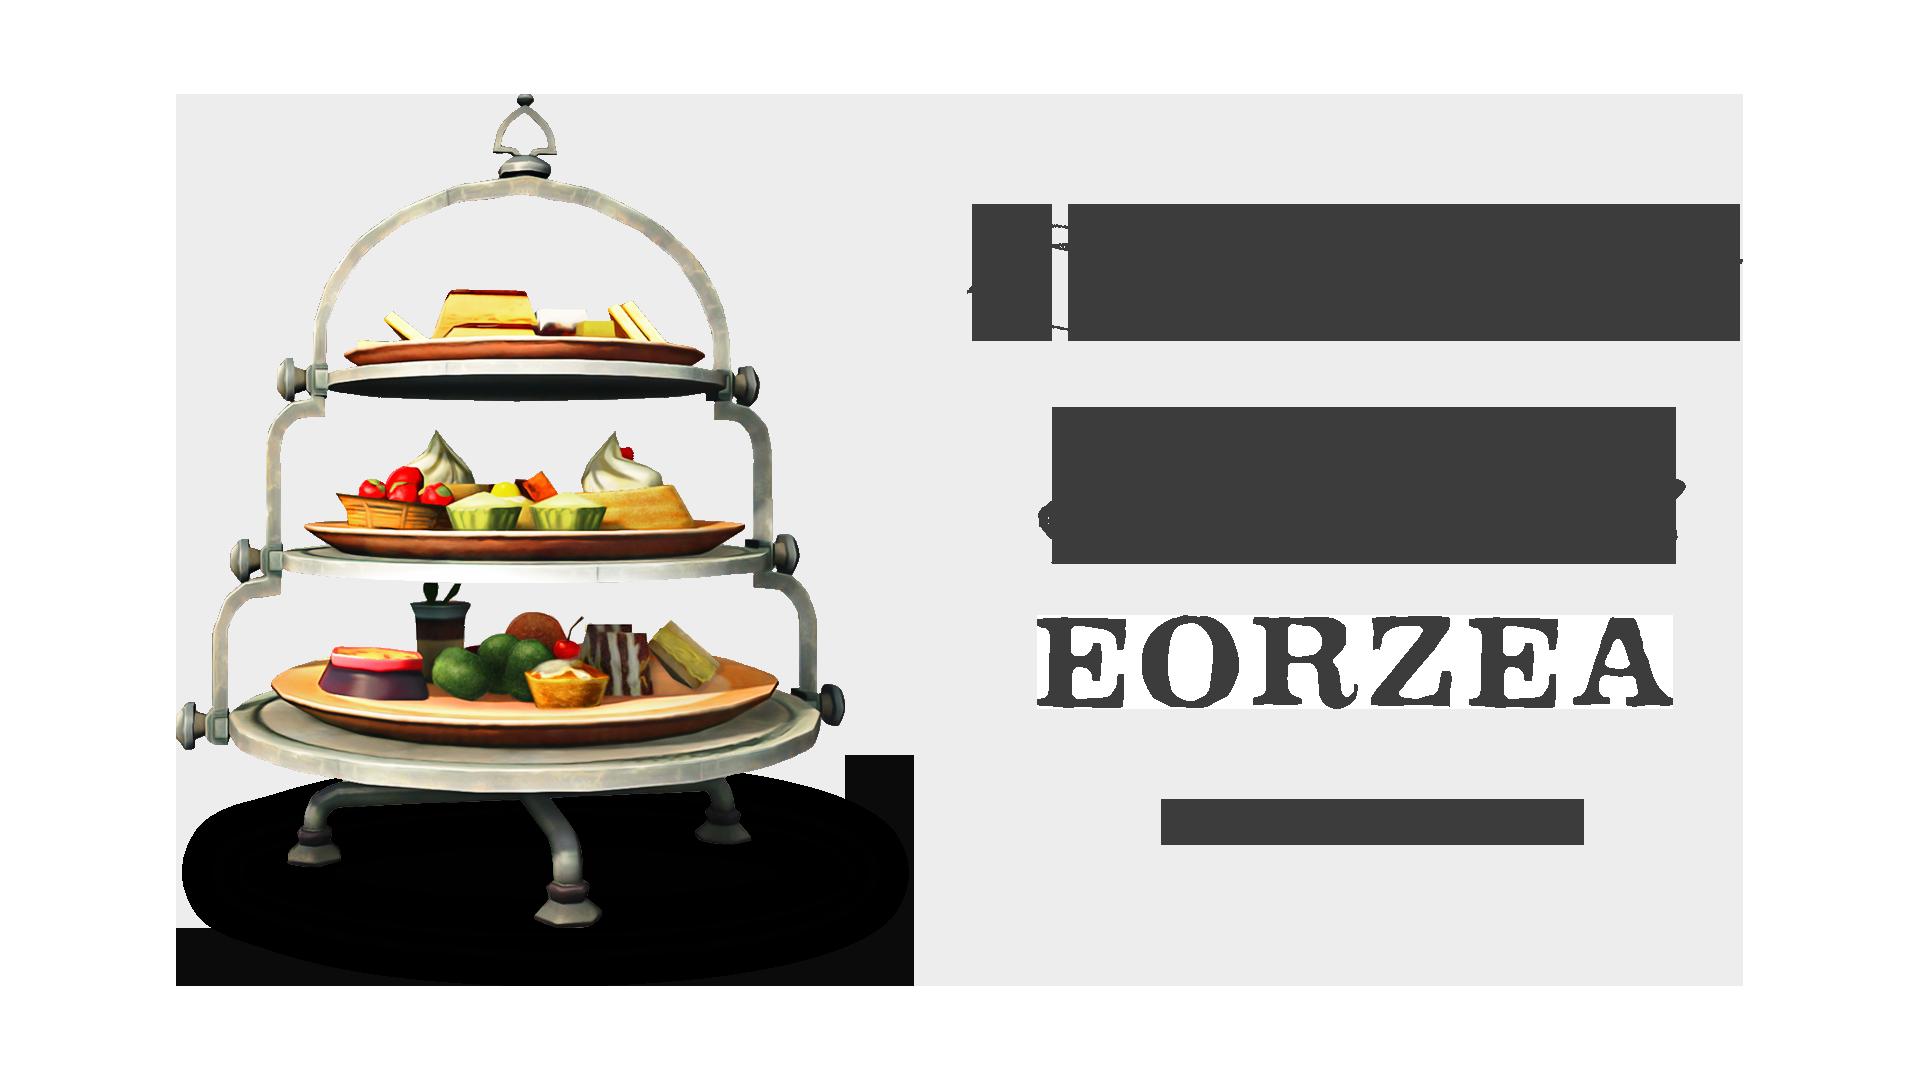 Delicious Eorzea